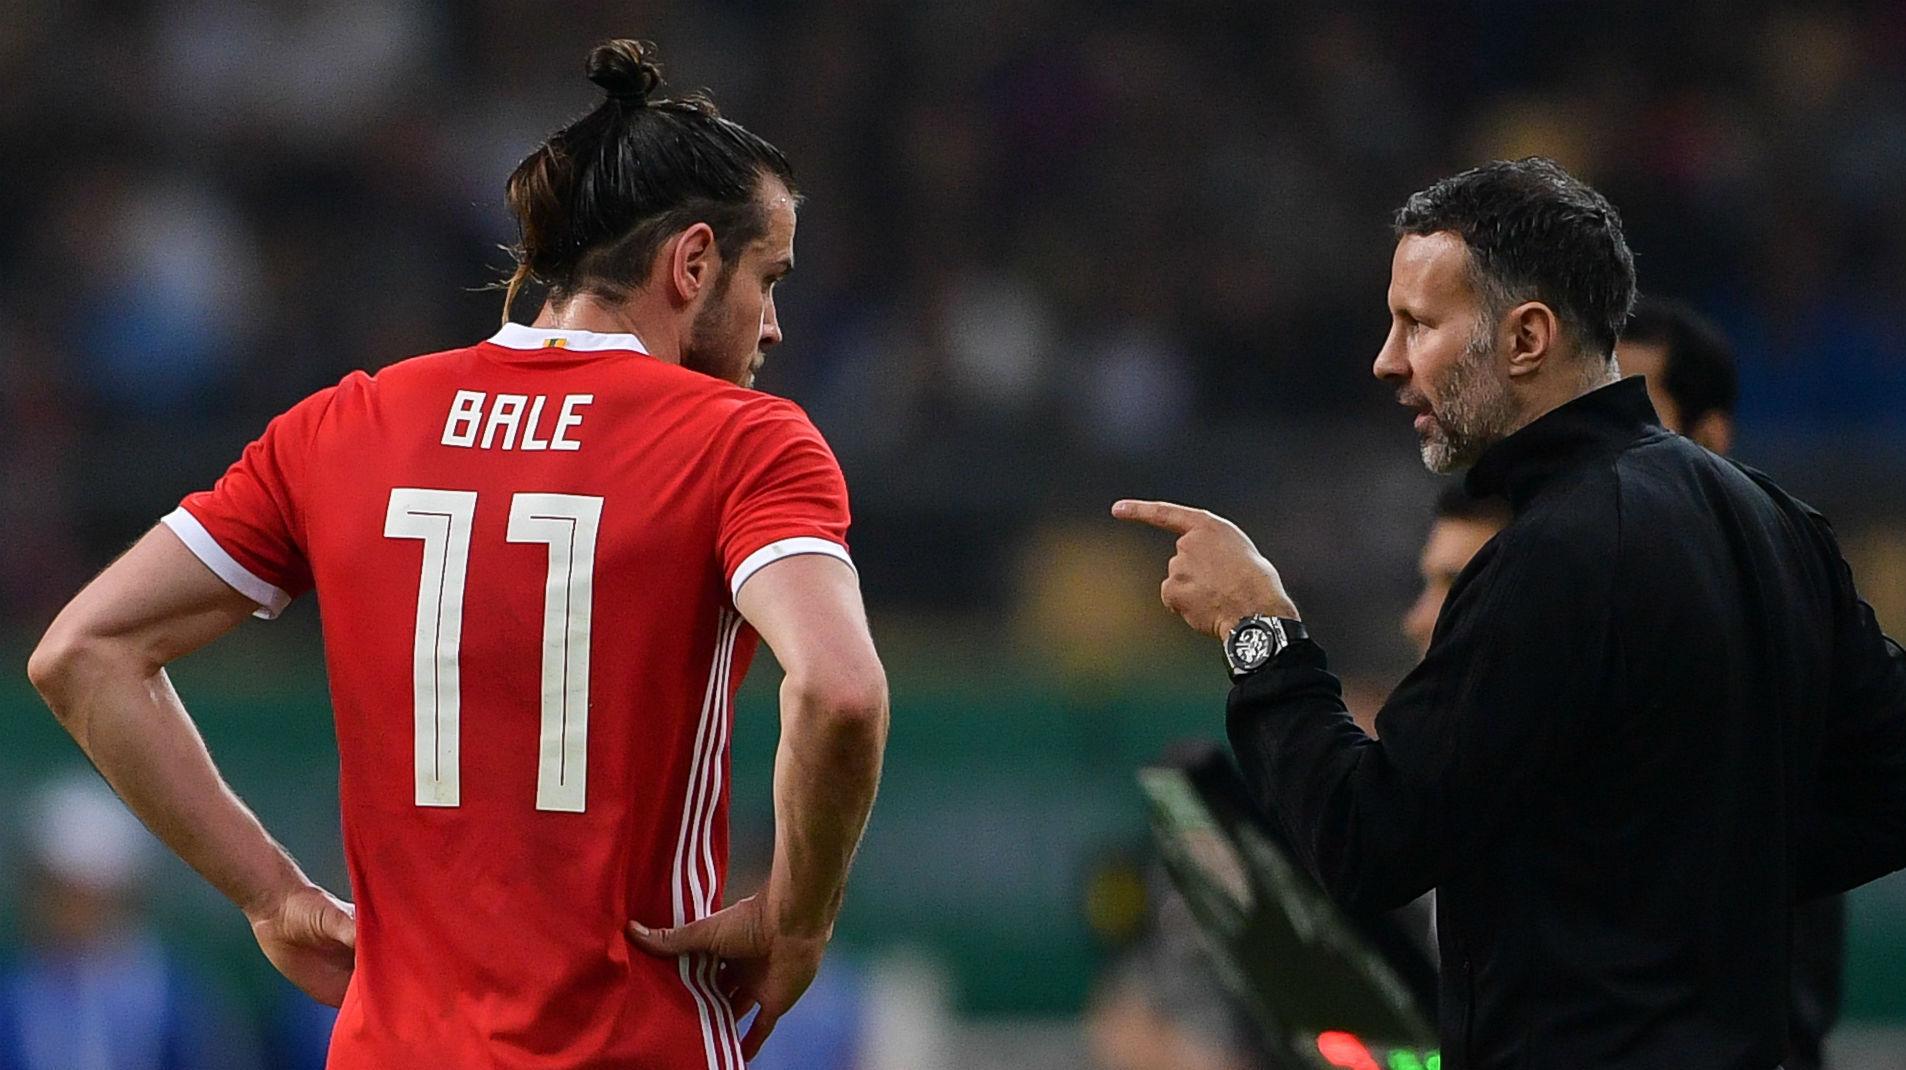 Albania vs Wales Live Stream International Soccer Match - 20 November 2018 on Livestream